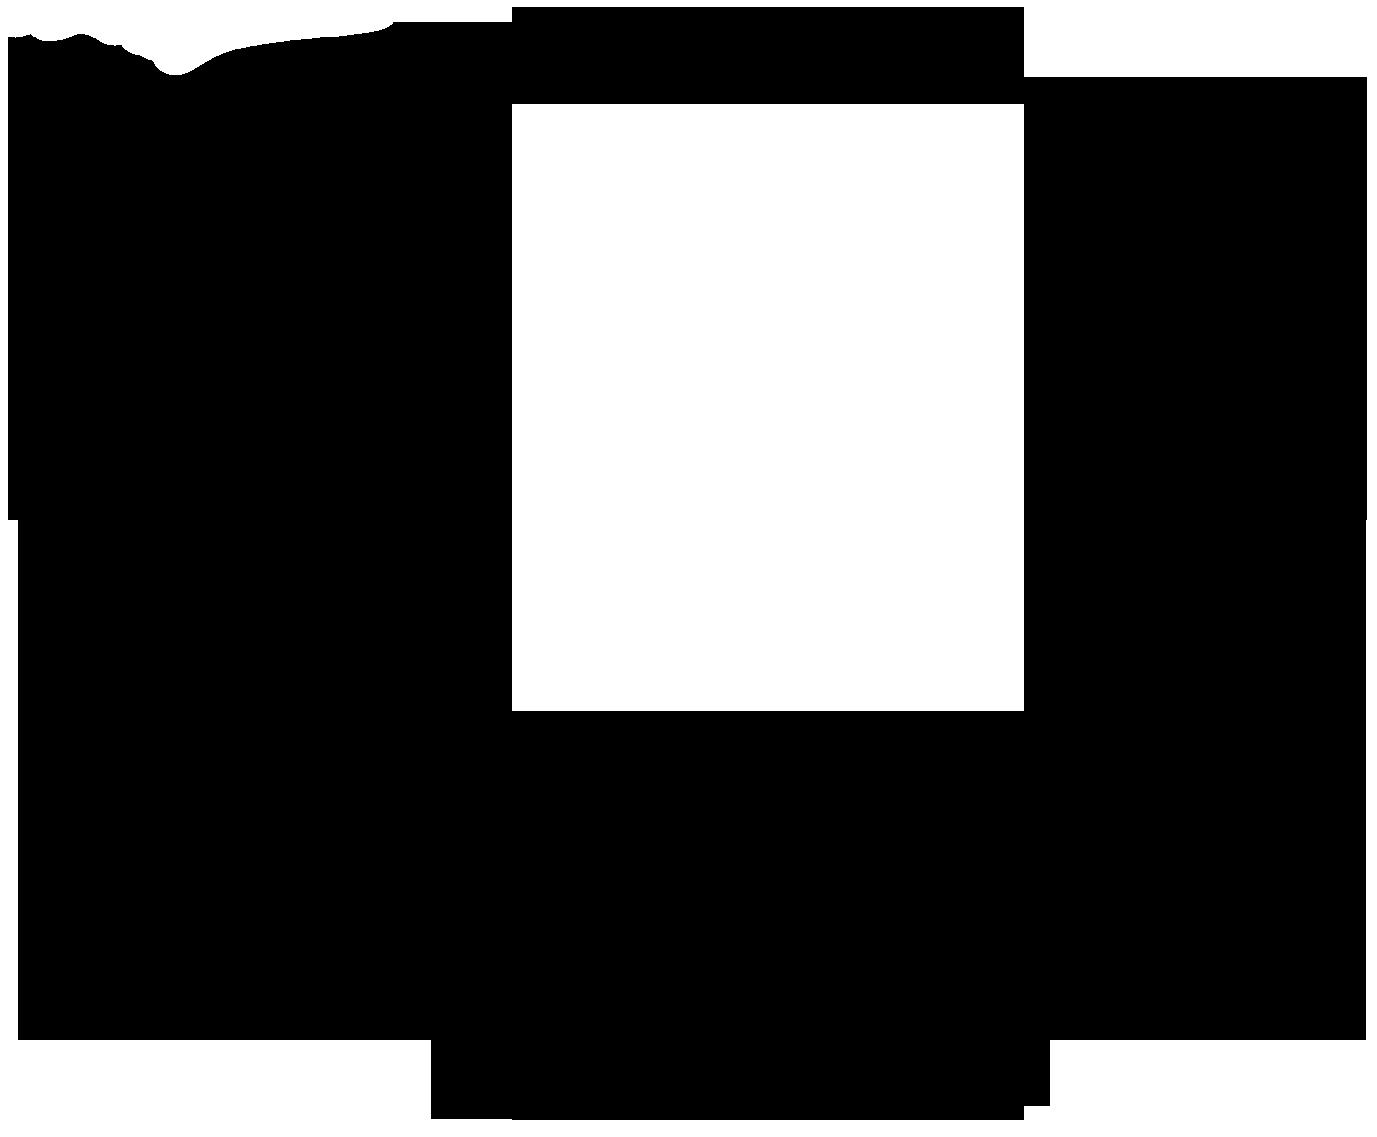 1377x1137 Black And White Watermelon Clipart Clipart Panda